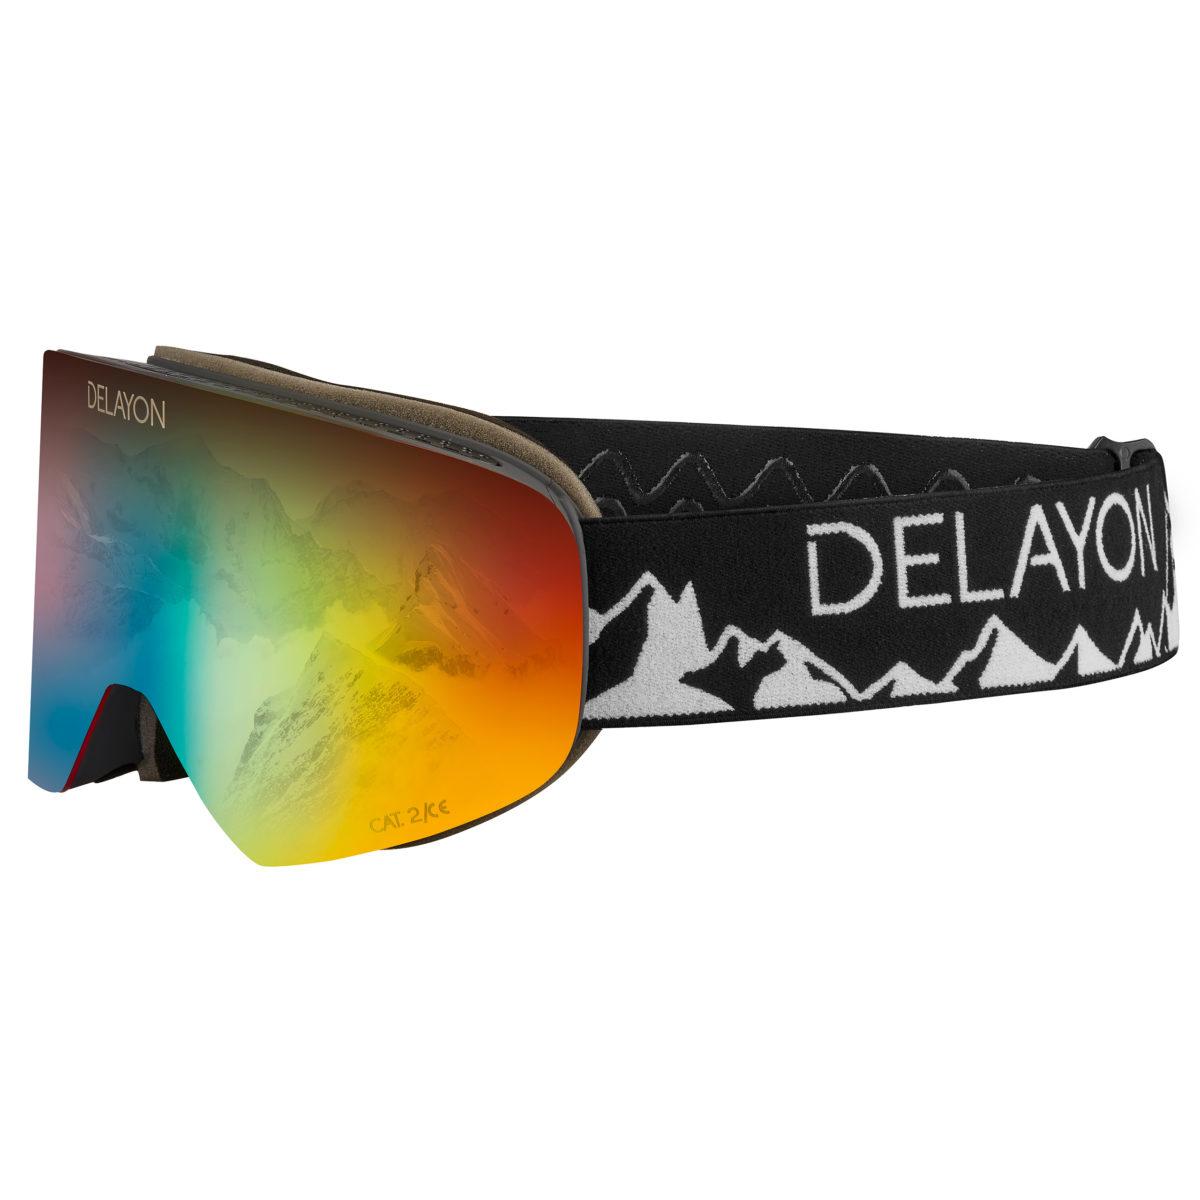 DELAYON Eyewear Tao Kreibich Signature Goggle Space Fire GoBiq Design